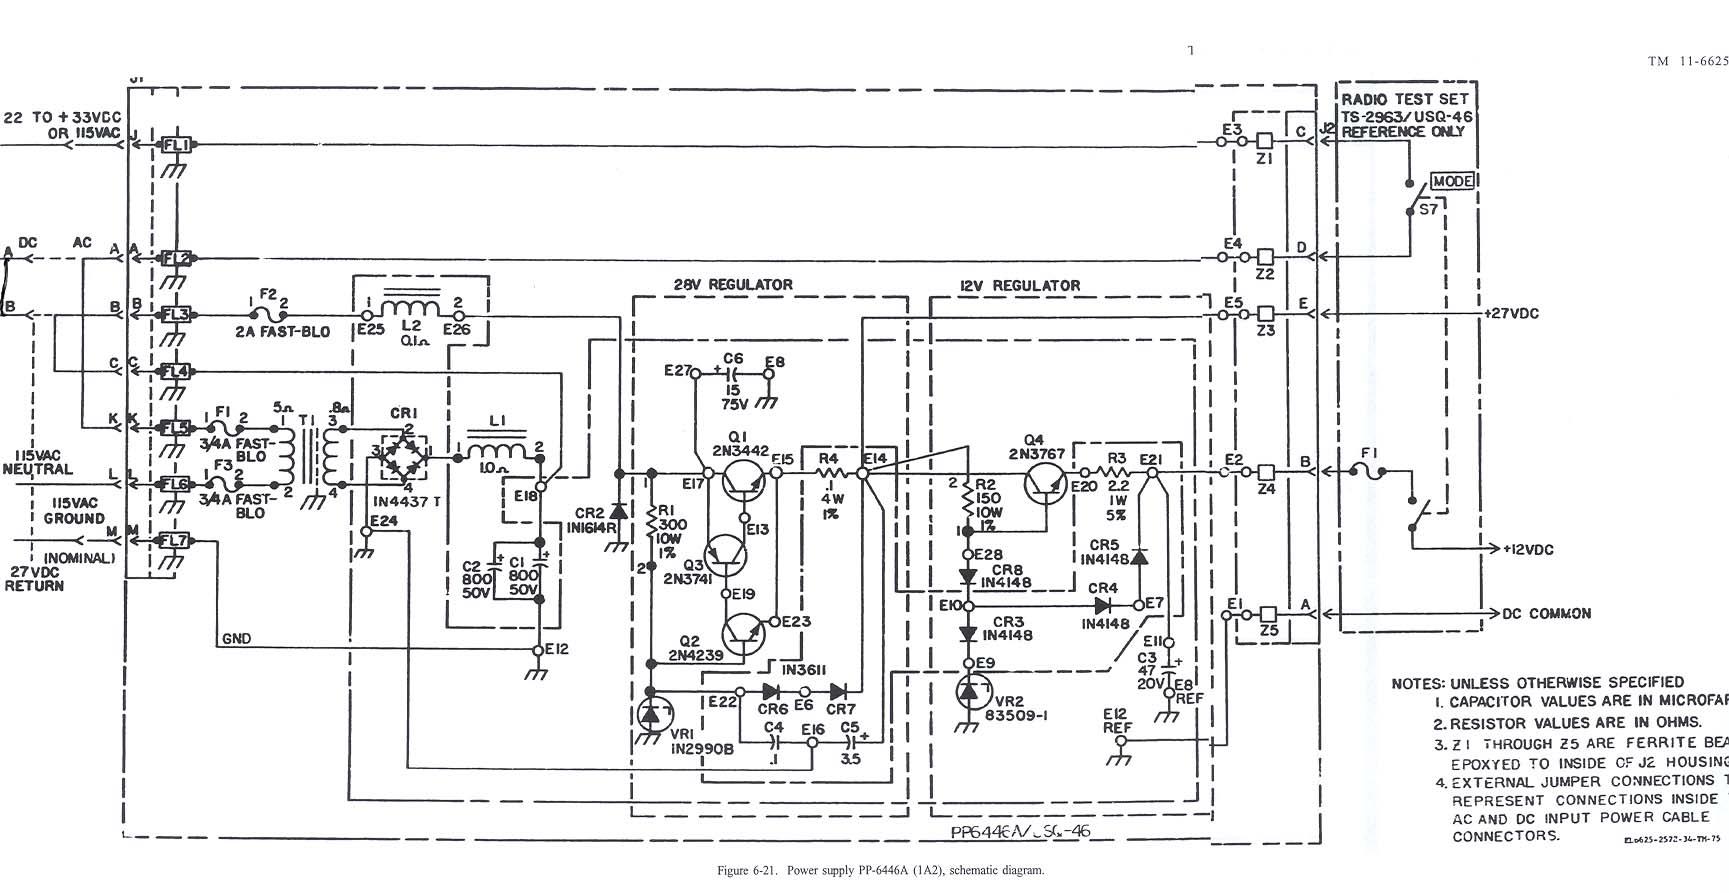 Usq Radio Frequency Monitor Sets